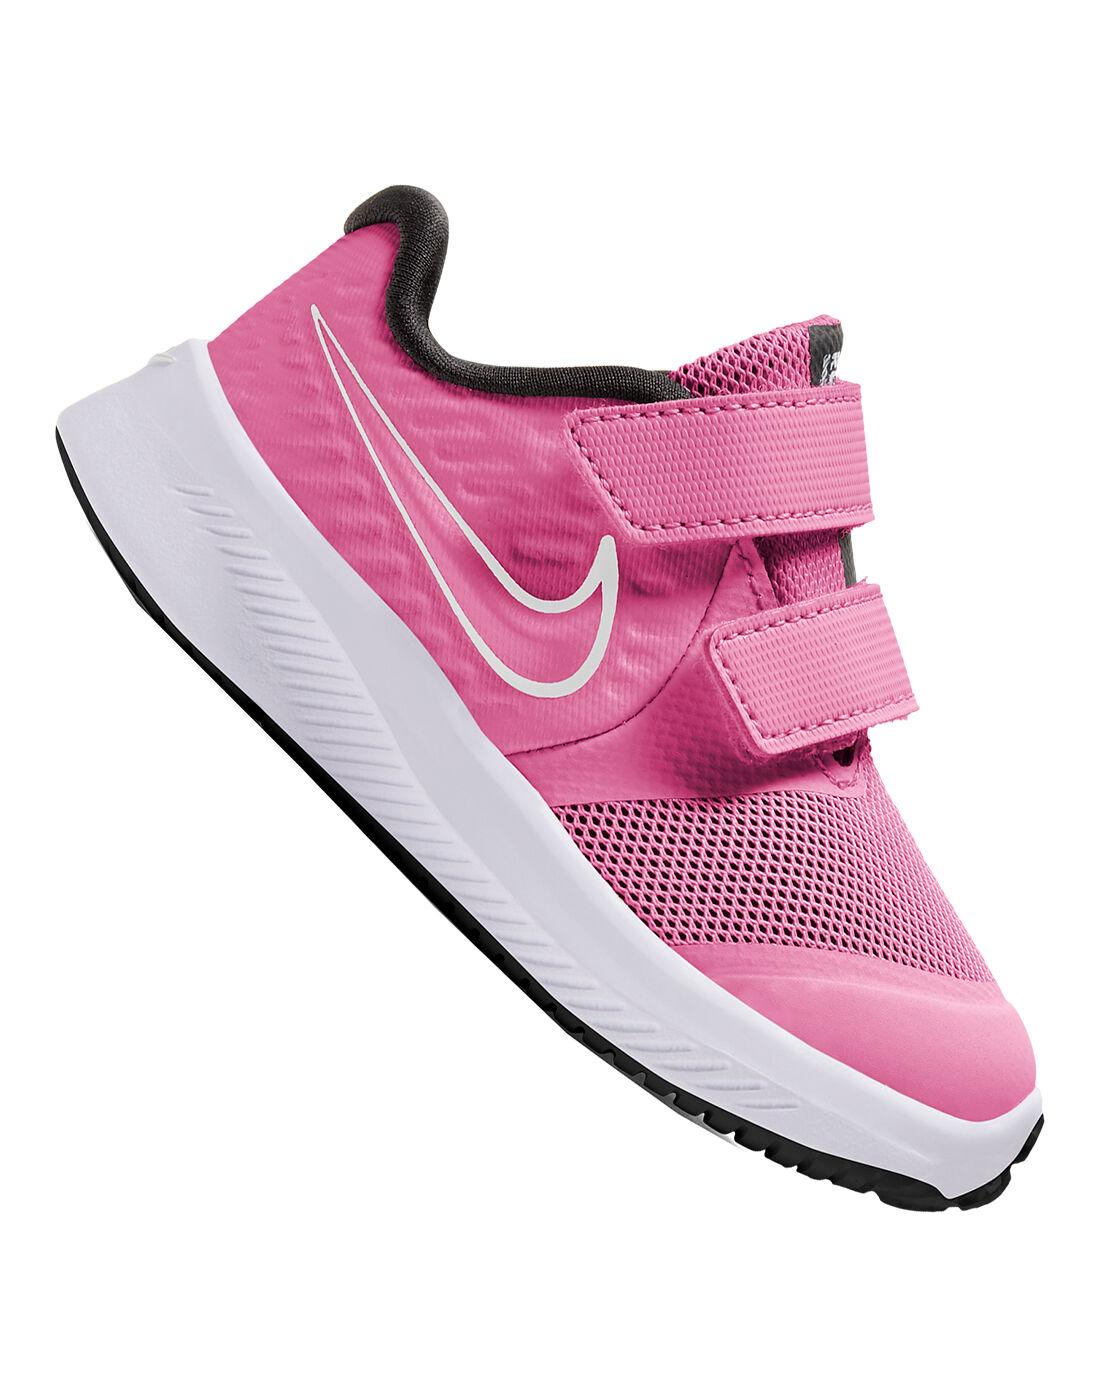 Nike adidas supplier requirements list   Infant Girls Star Runner